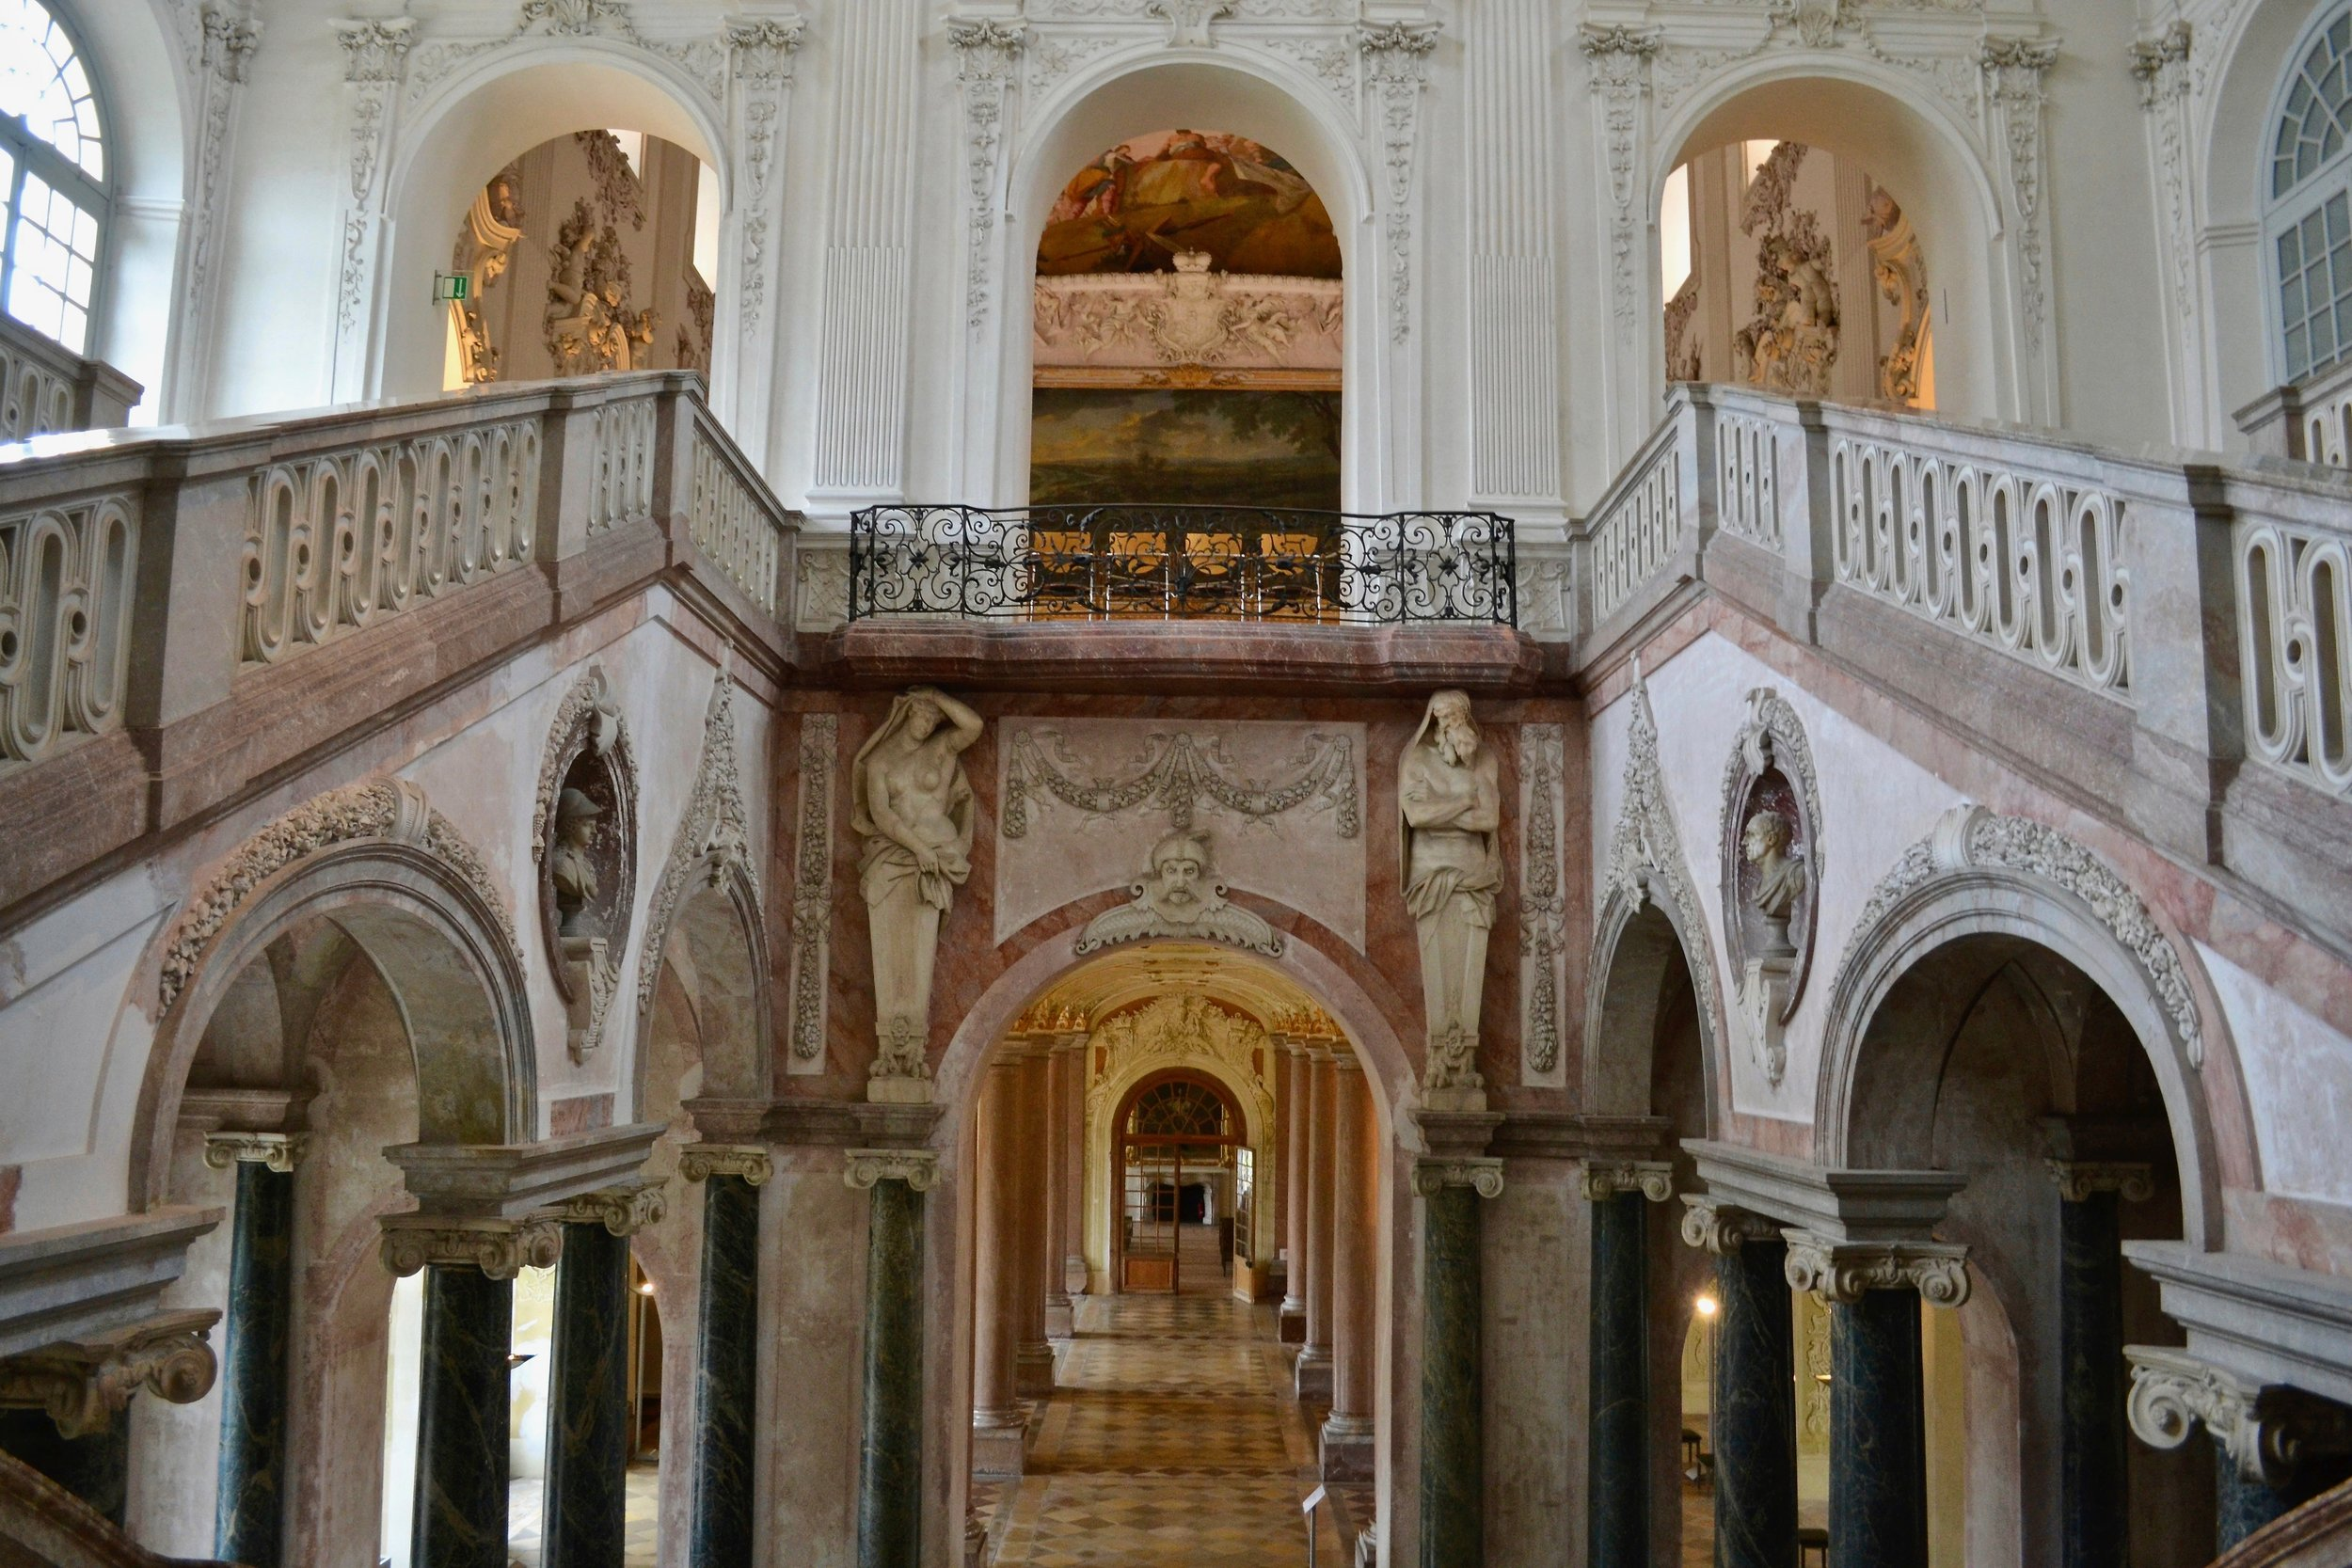 Schleissheim Palace Staircase